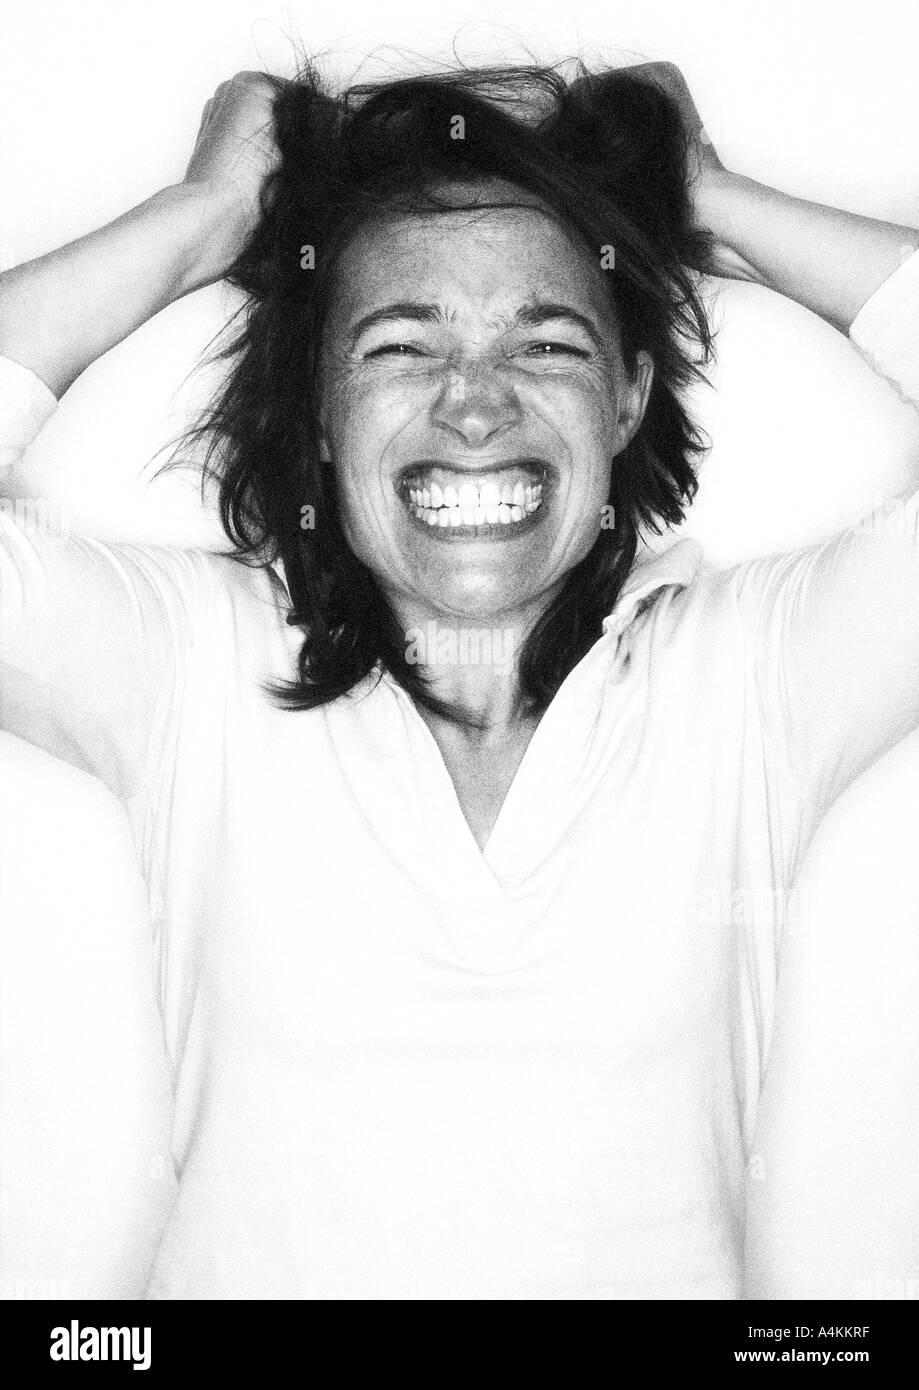 Woman gritting teeth, pulling hair, portrait - Stock Image